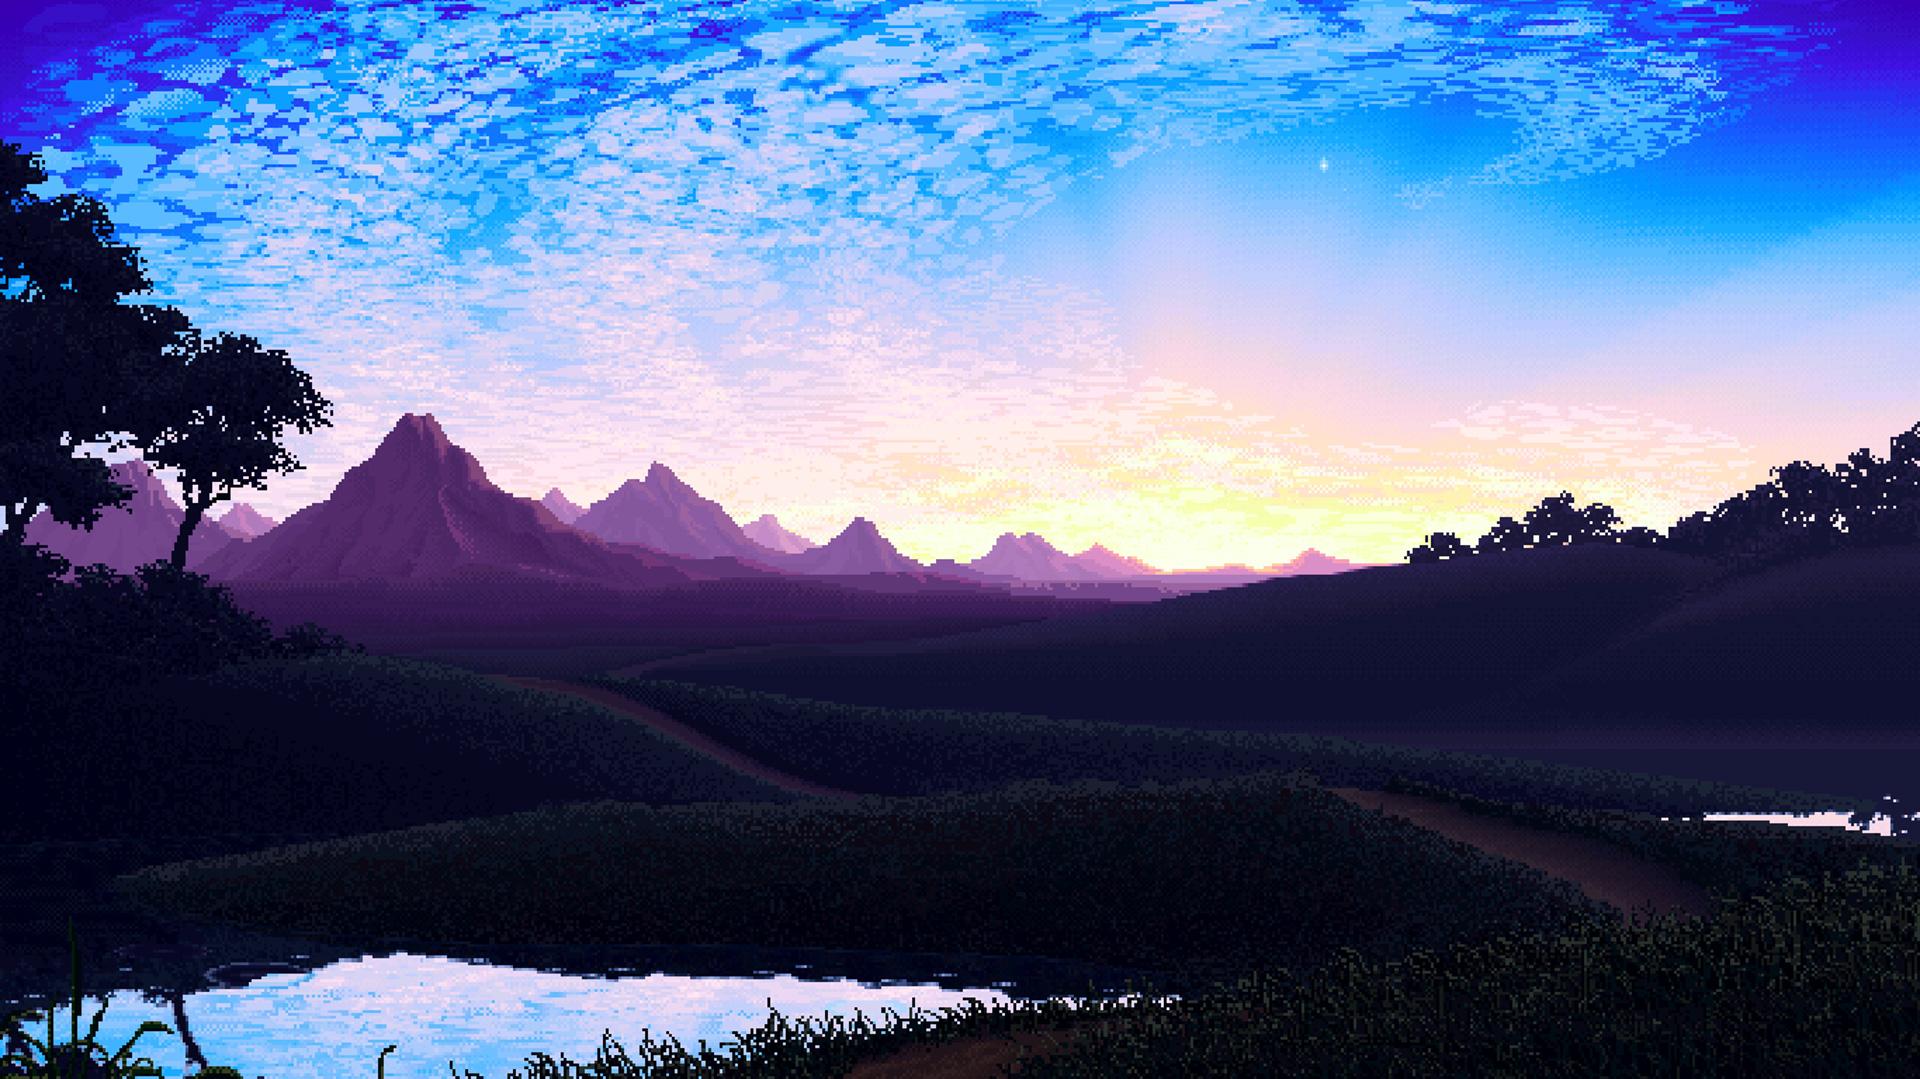 Pixel Landscape, HD Artist, 4k Wallpapers, Images ...